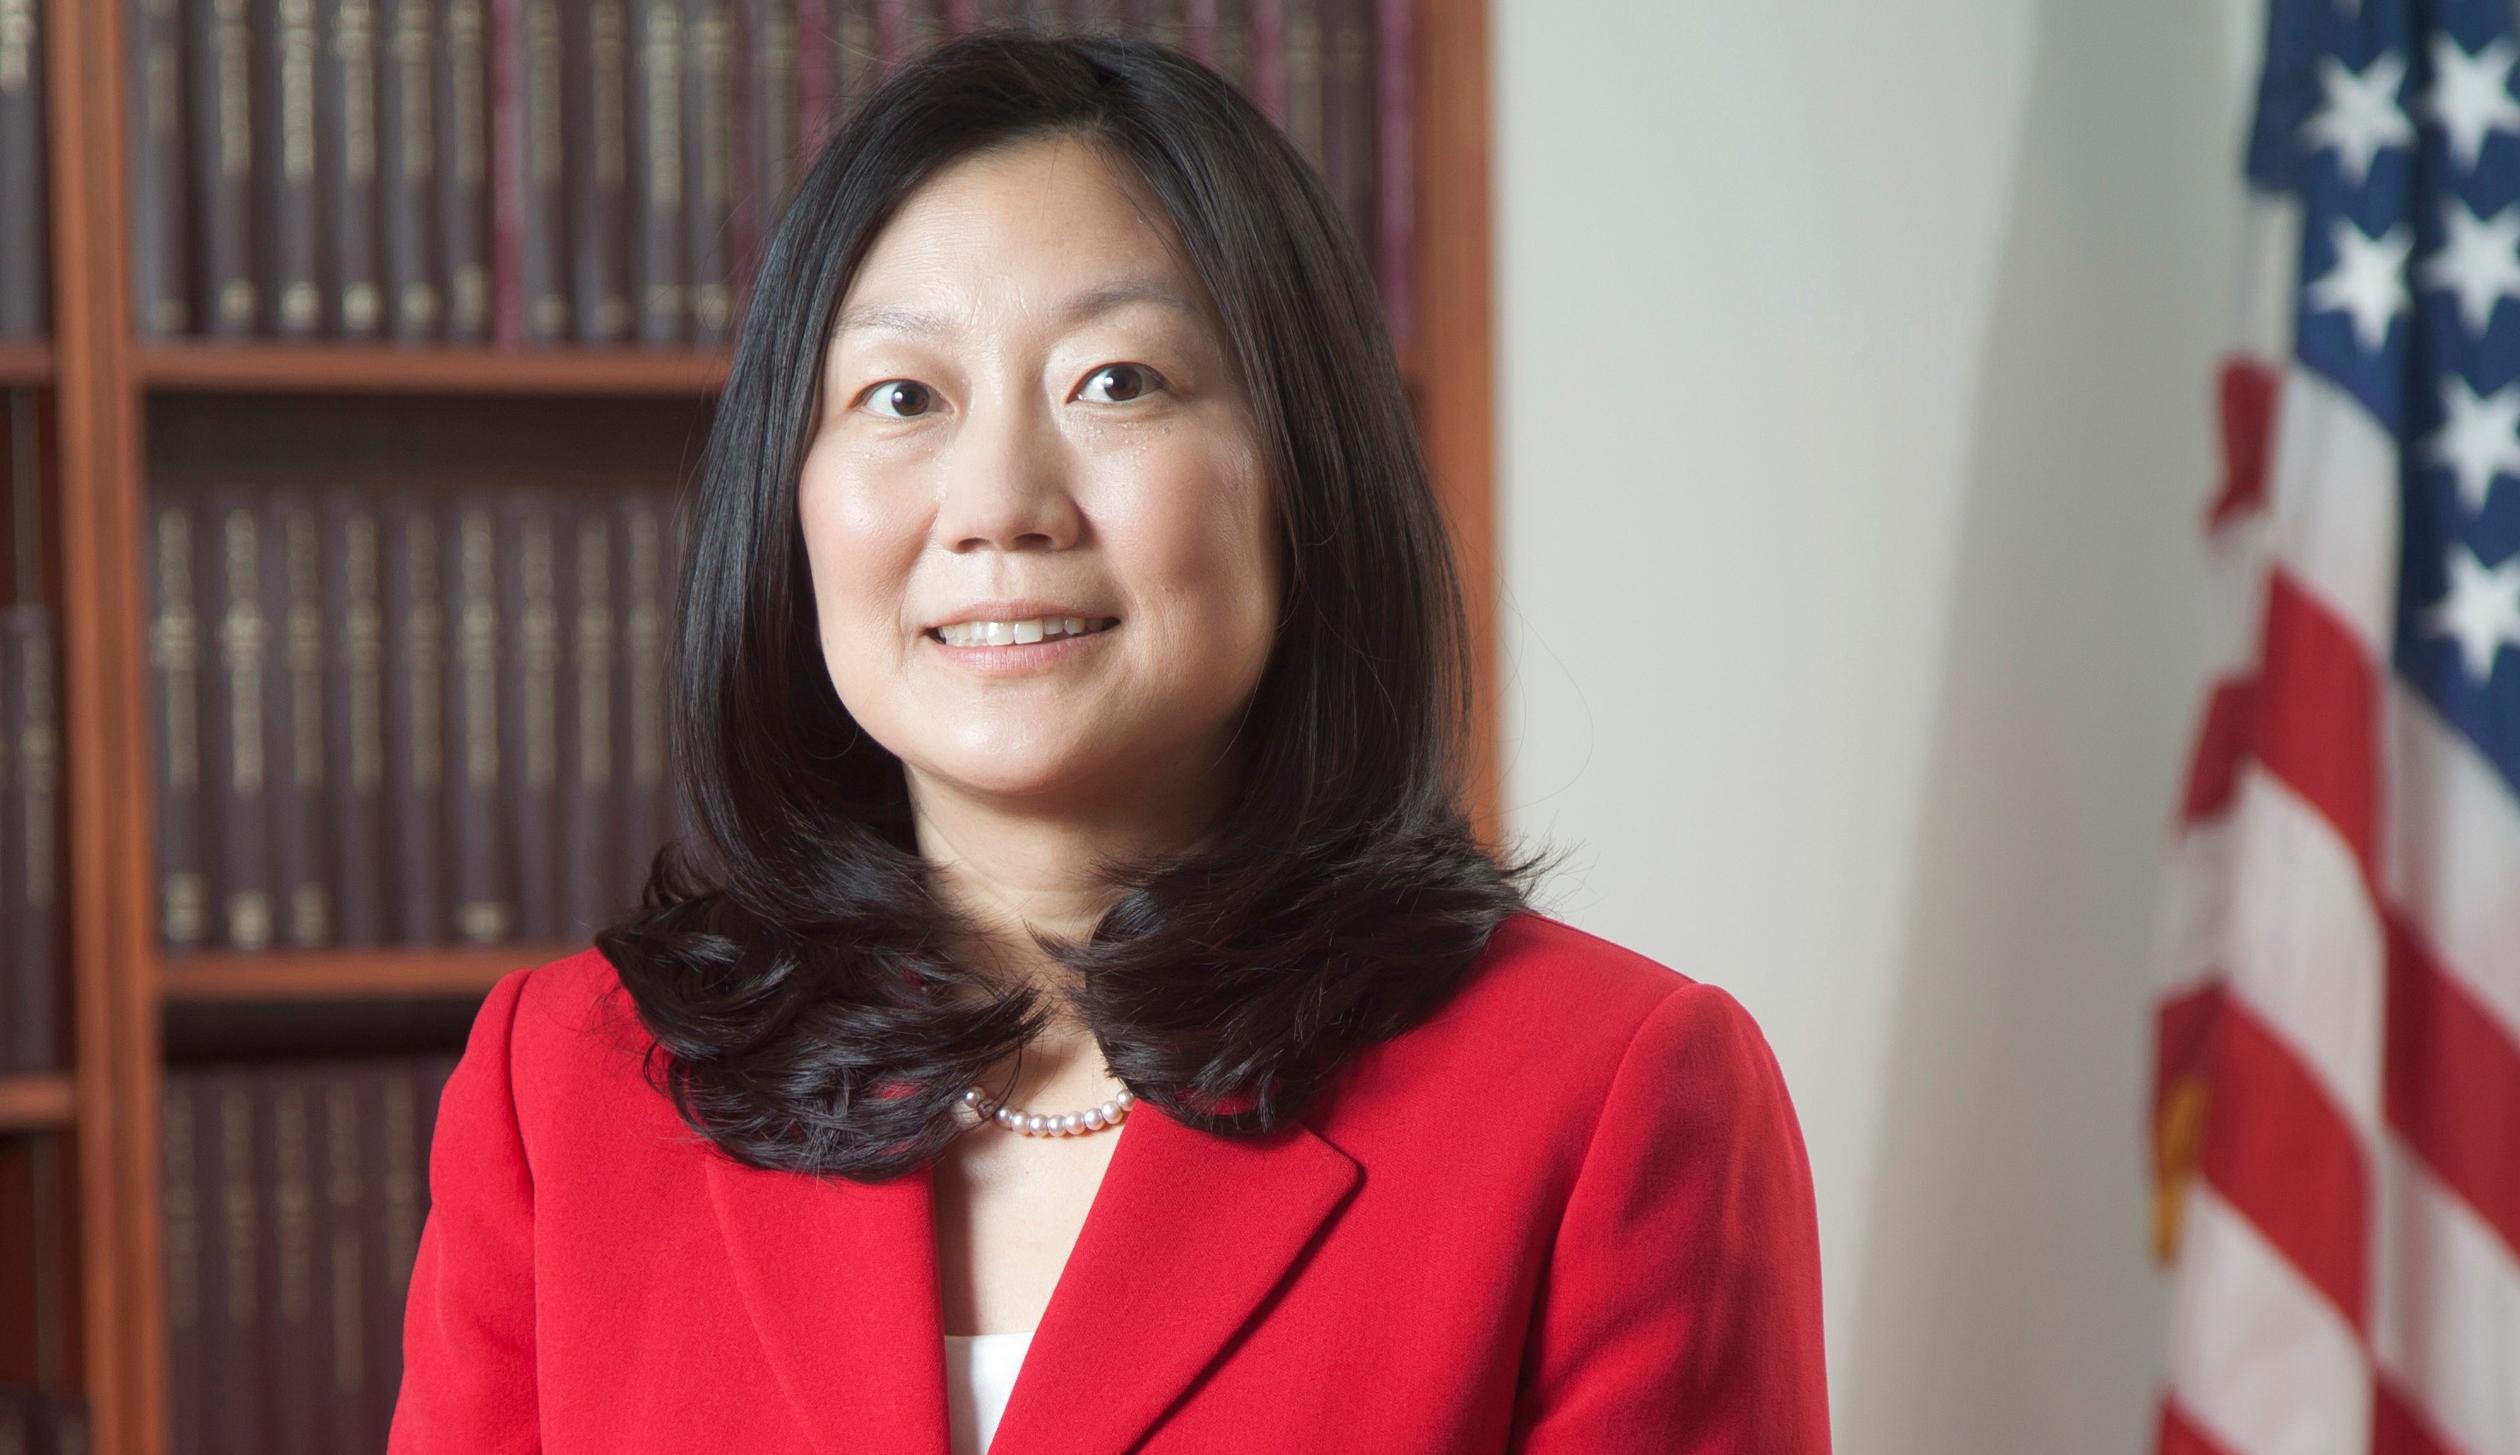 U.S. District Judge Lucy Koh